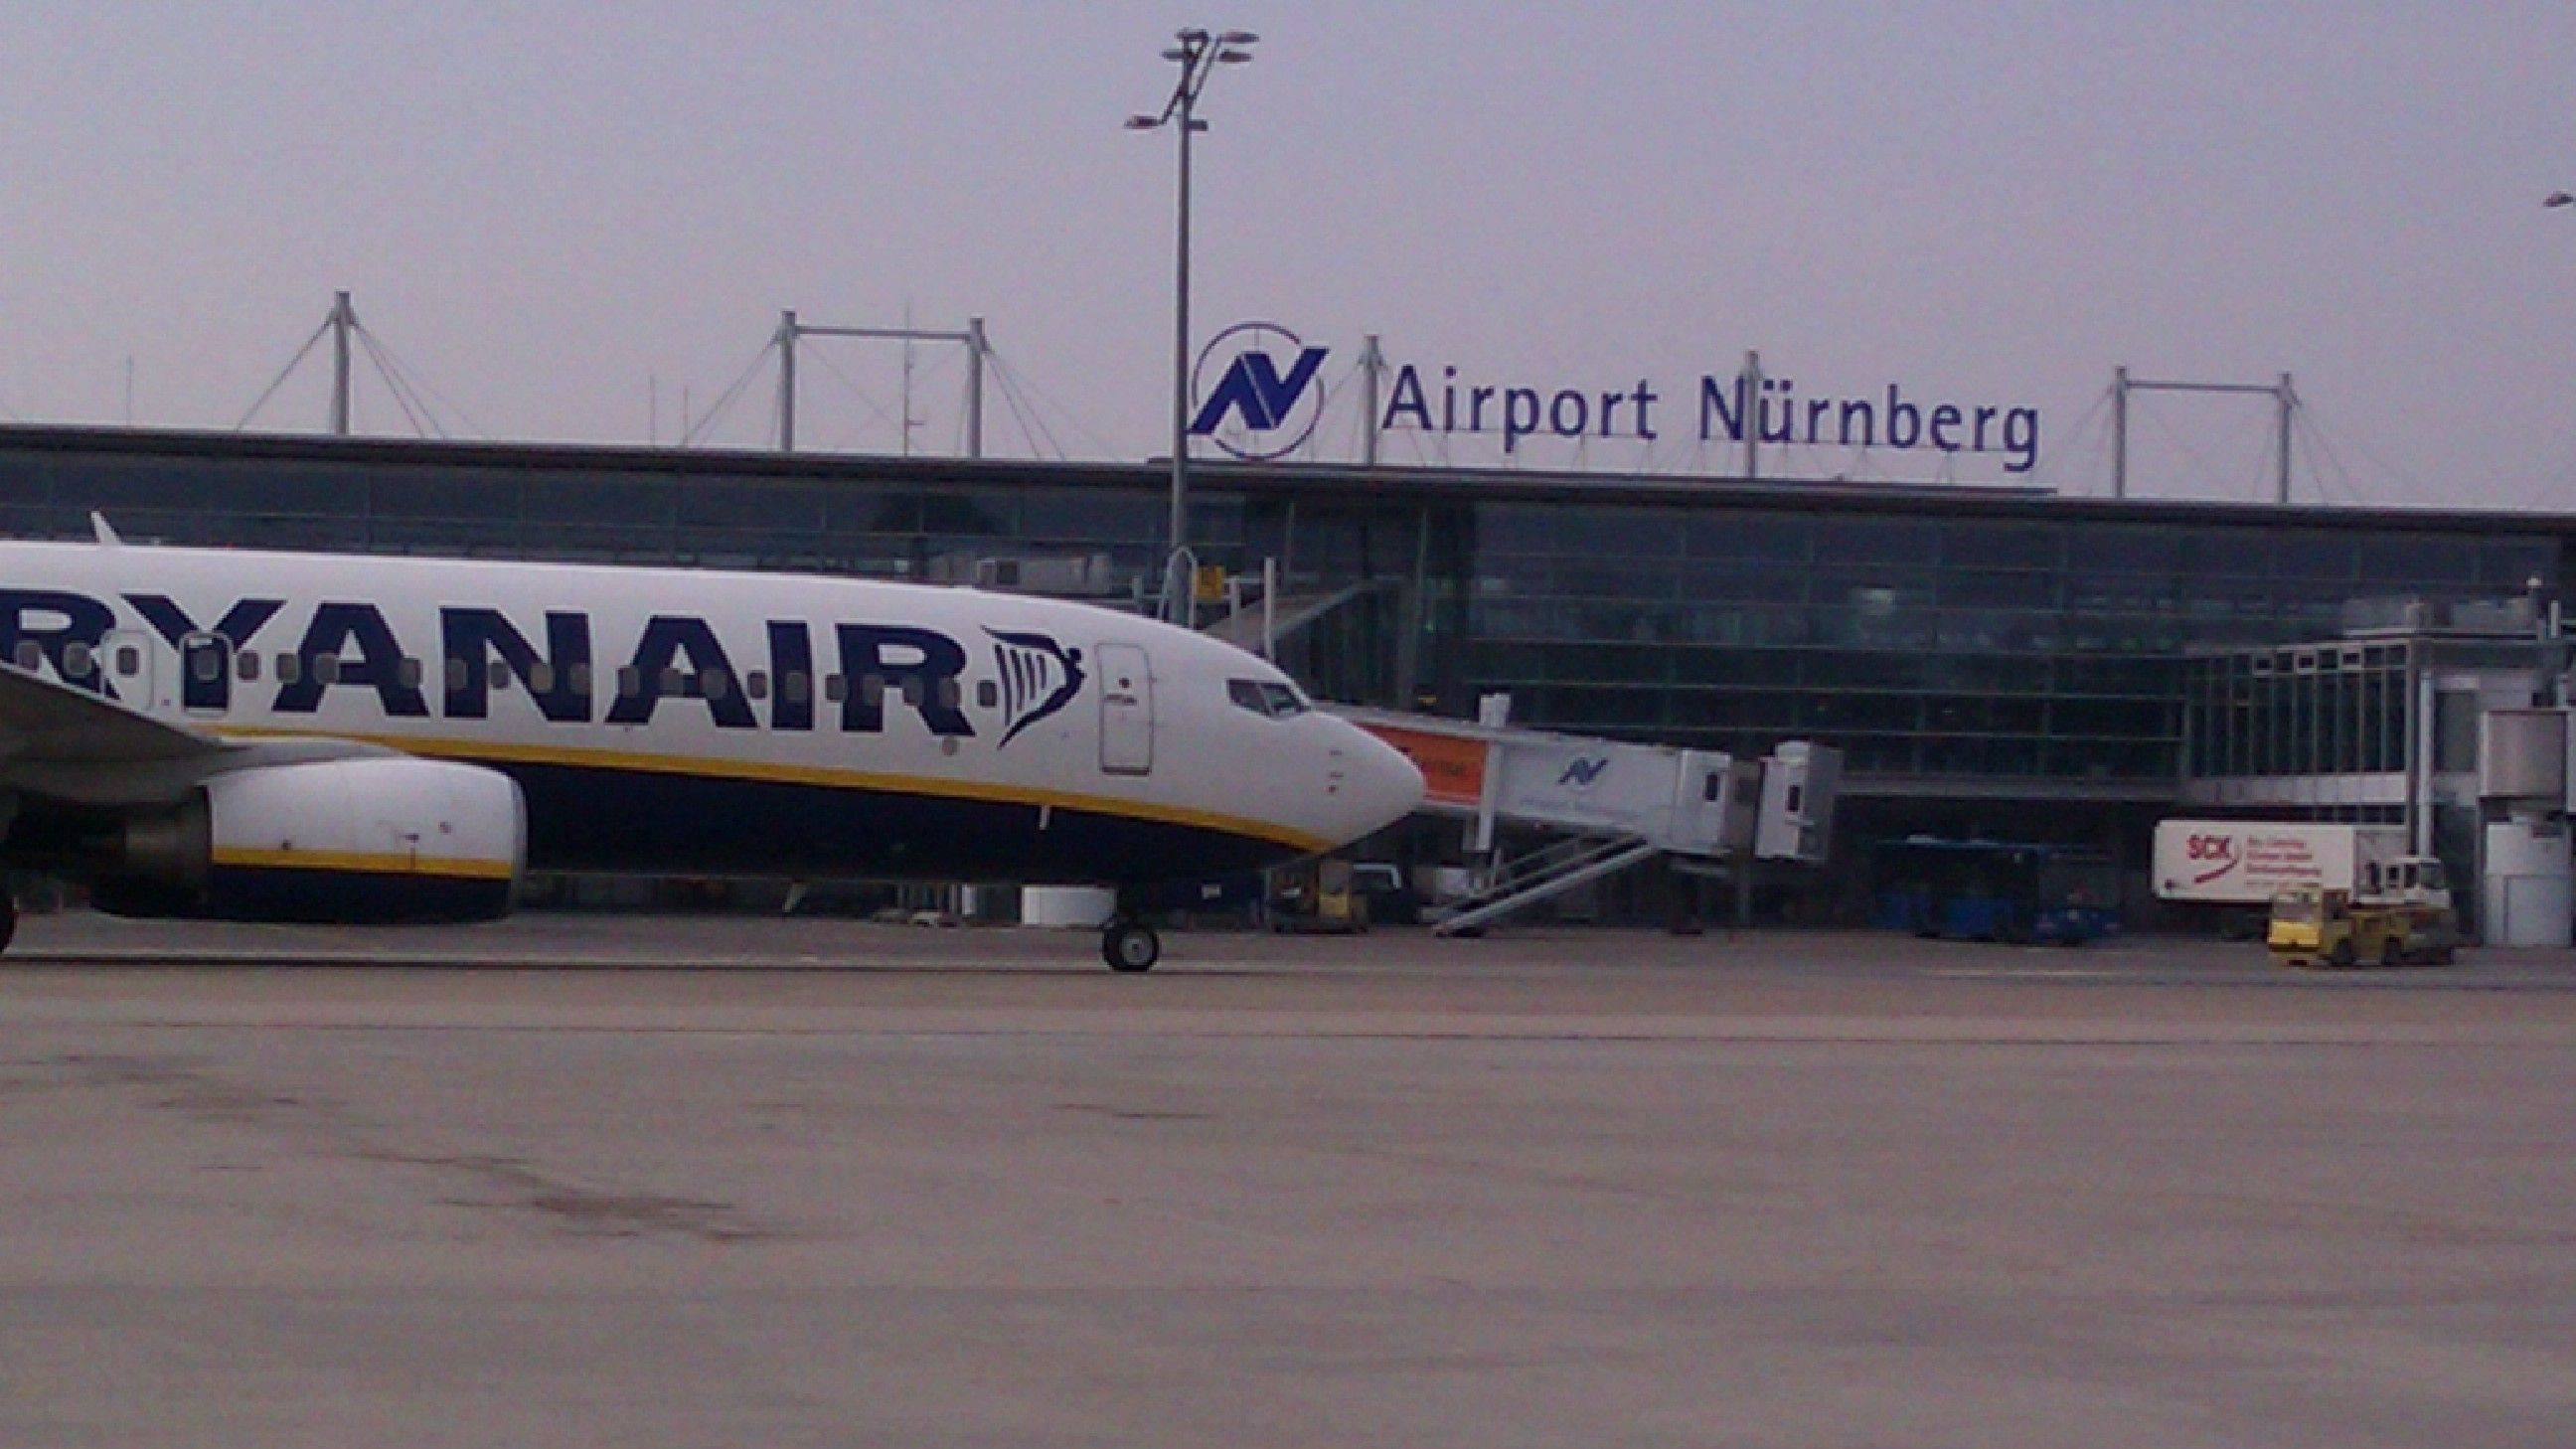 Ryanair-Flugzeug auf dem Rollfeld in Nürnberg